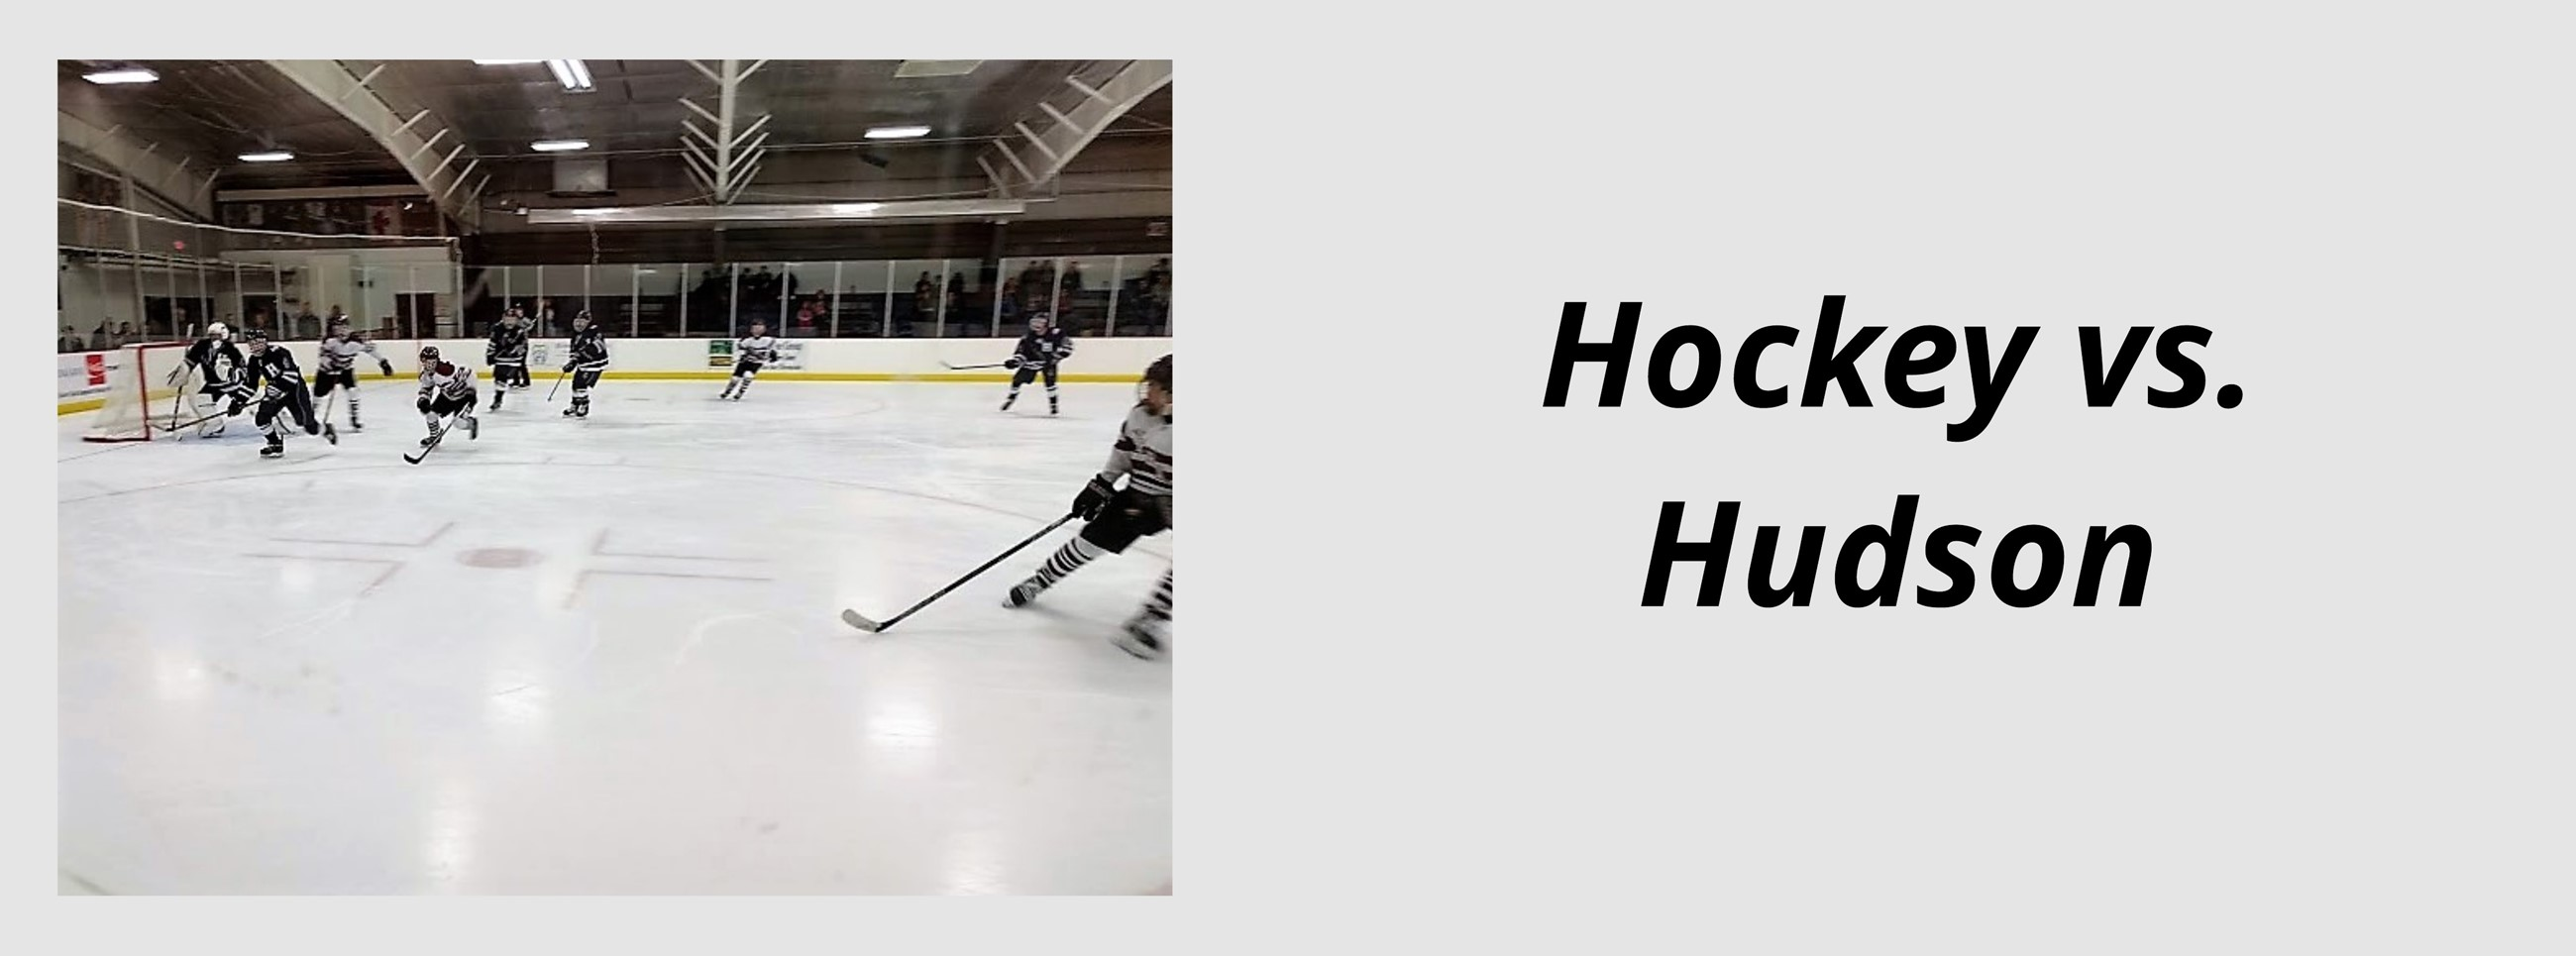 Boys hockey team playing on the ice